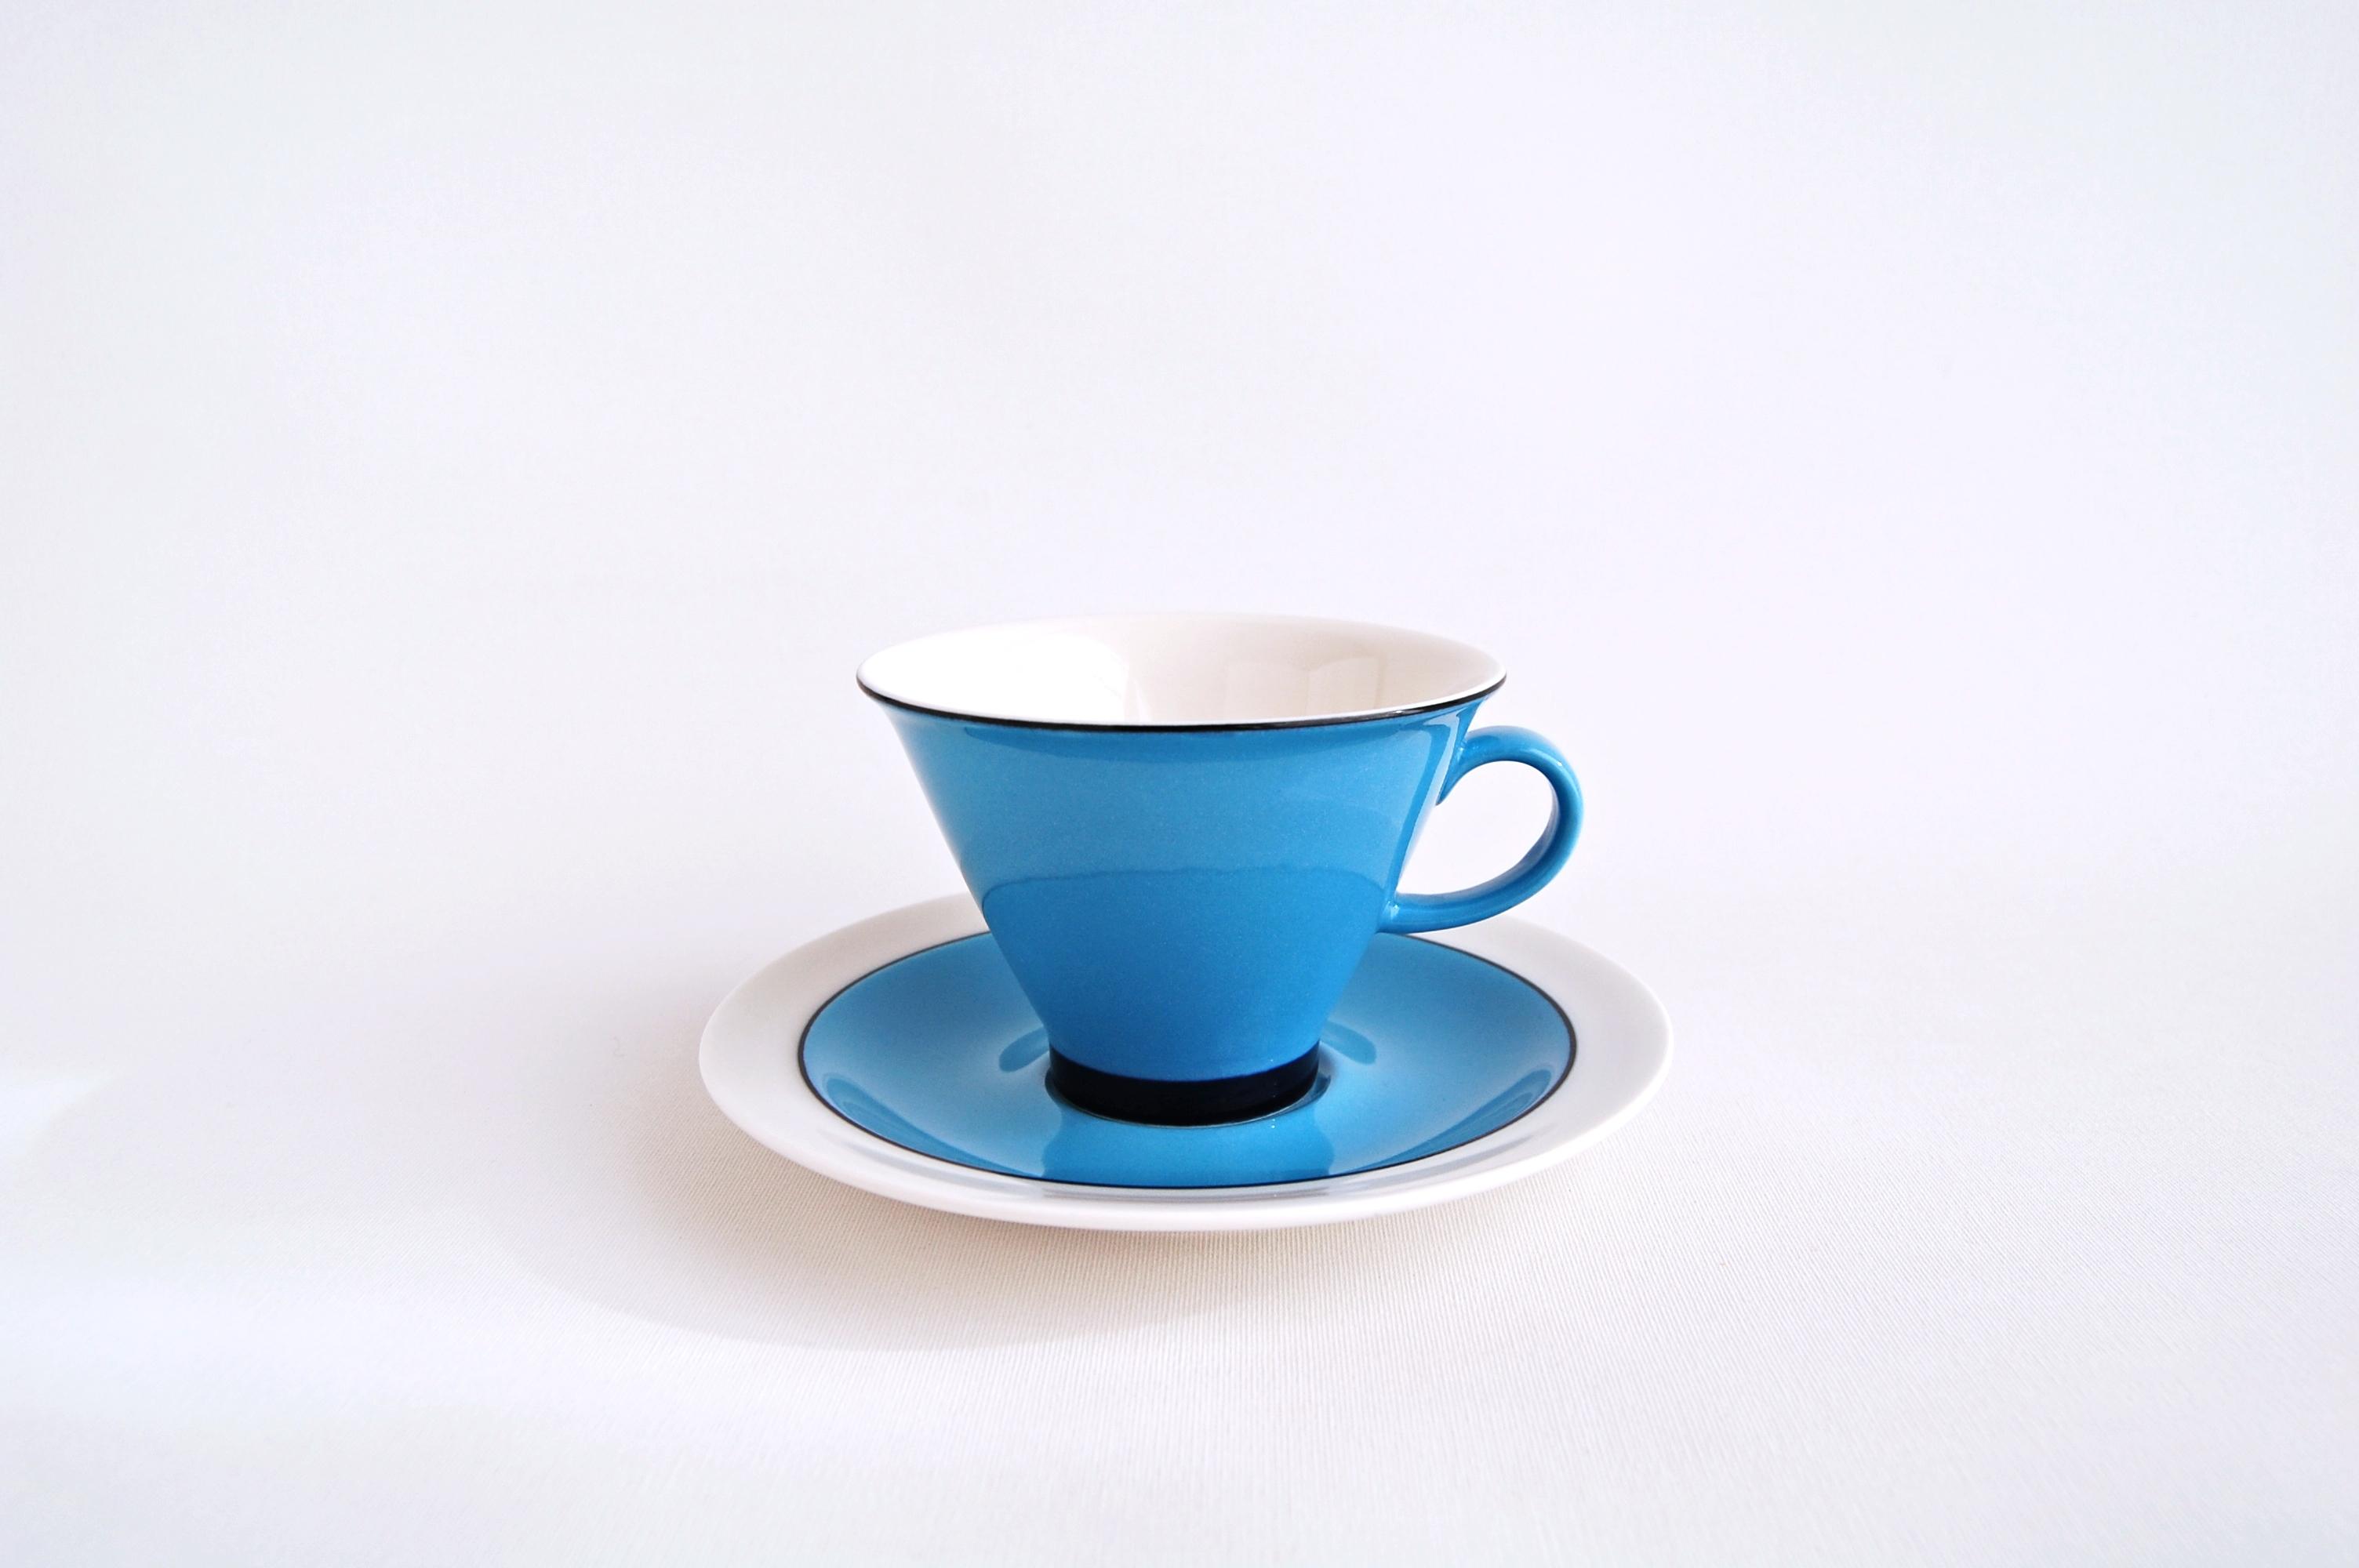 ARABIA/アラビア Harlekin Turkos コーヒーカップ&ソーサー 001